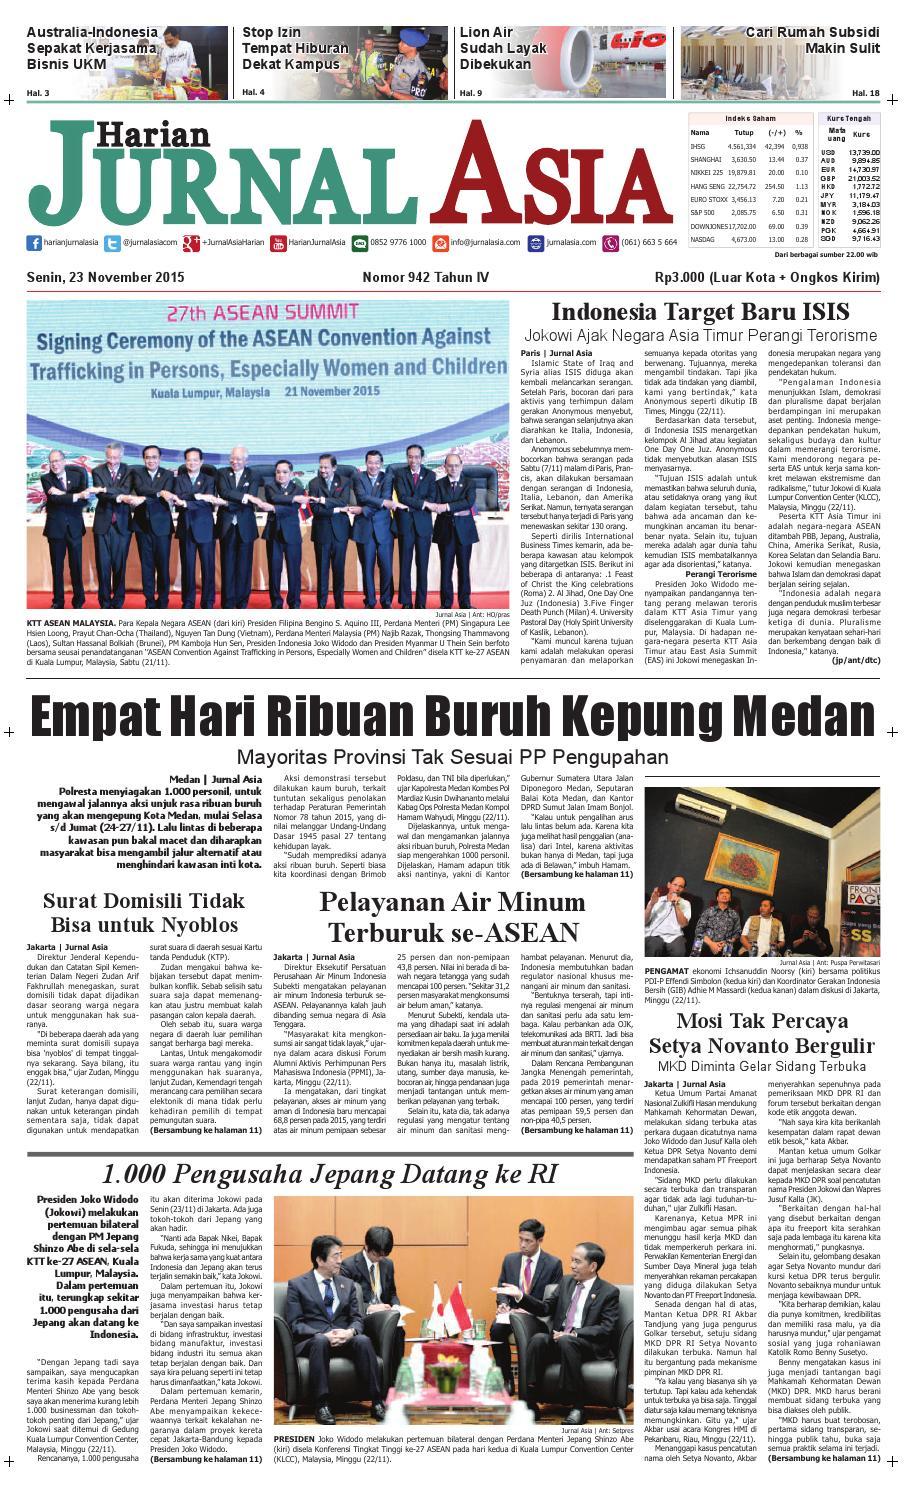 Harian Jurnal Asia Edisi Senin 23 November 2015 By Produk Ukm Bumn Tenun Pagatan Kemeja Pria Biru Kapal Medan Issuu